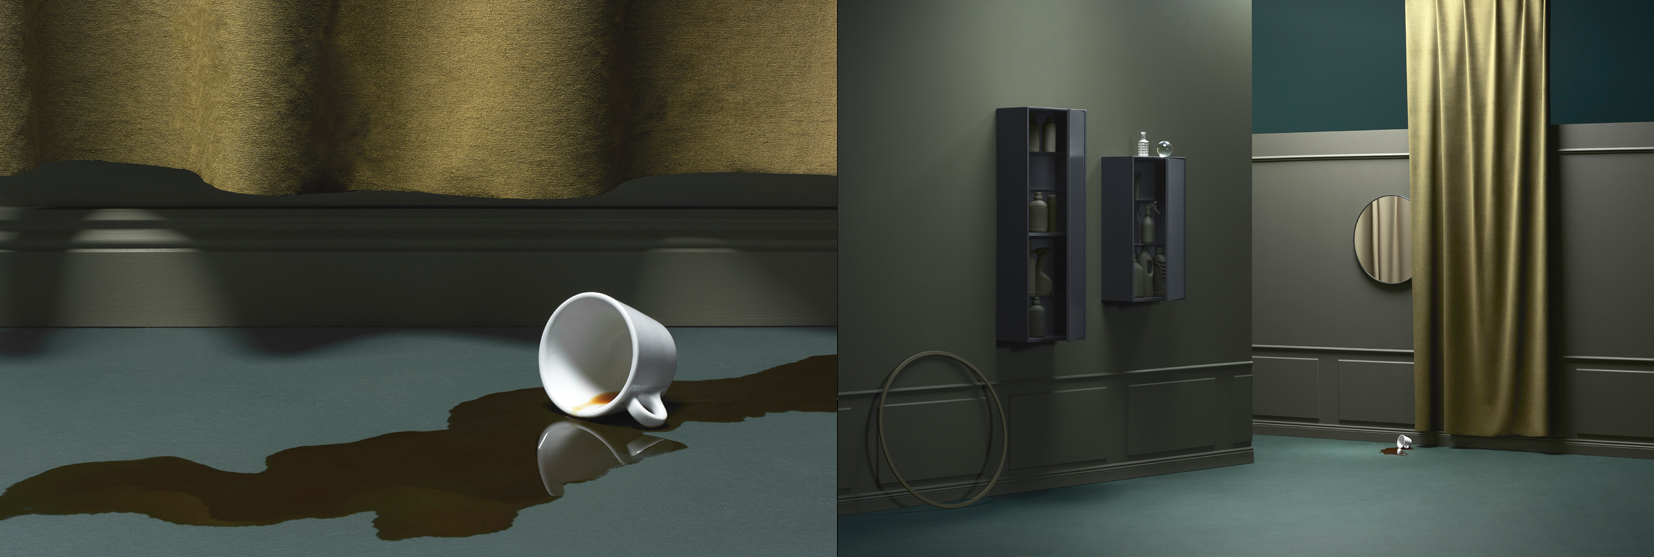 Byt badrum. inspirerande badrumsmöbler från hafa.   hafa badrum